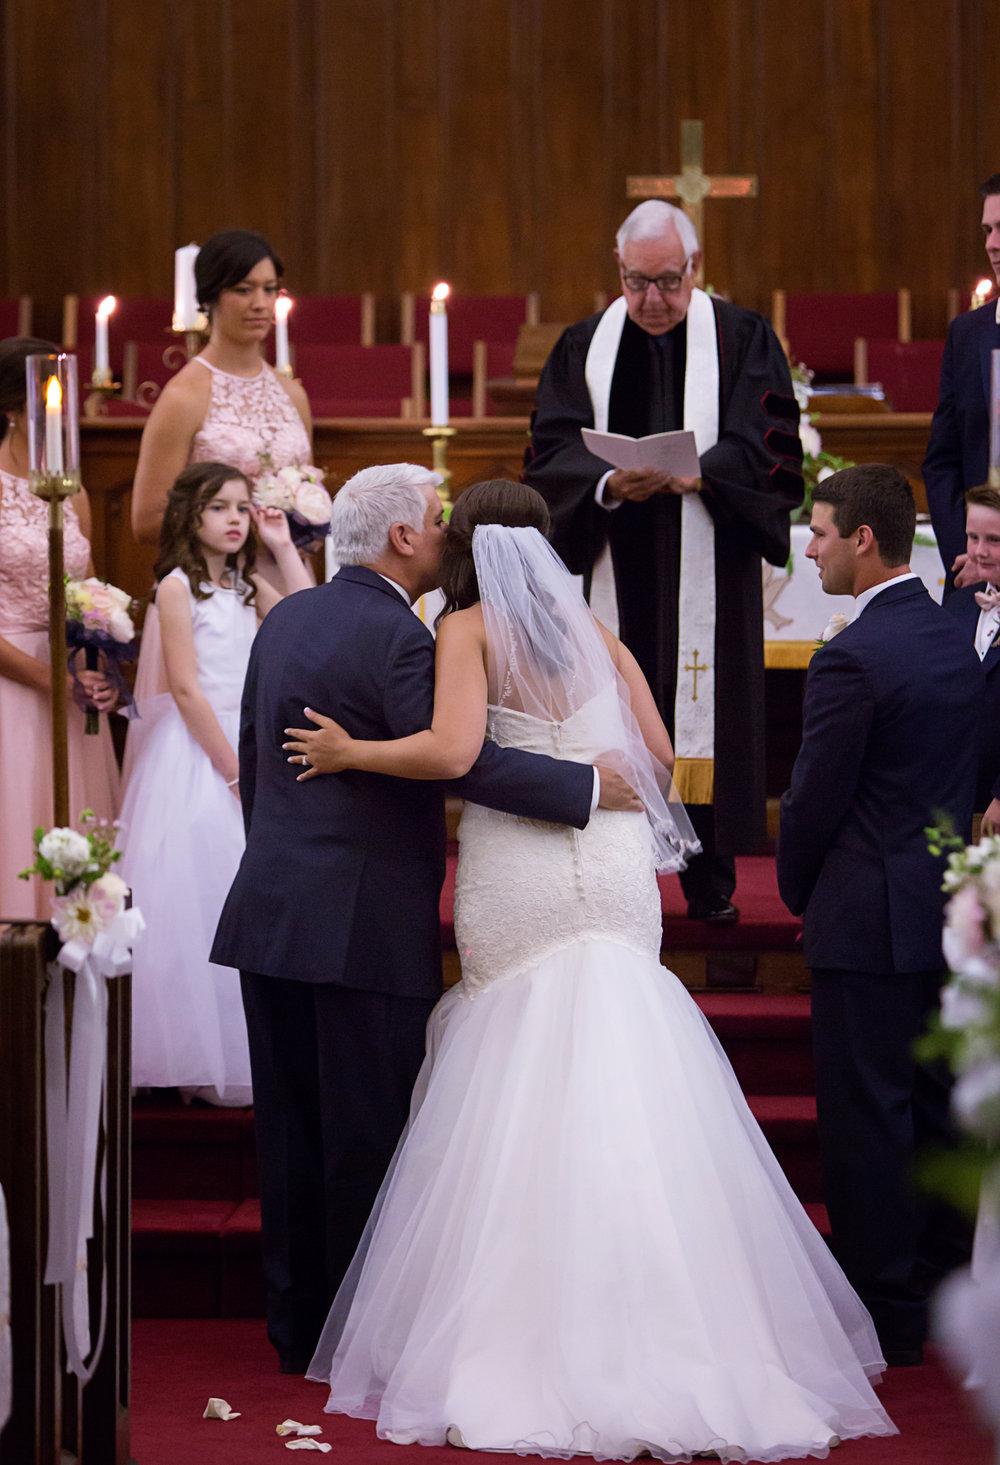 Southall Wedding 0362.jpg